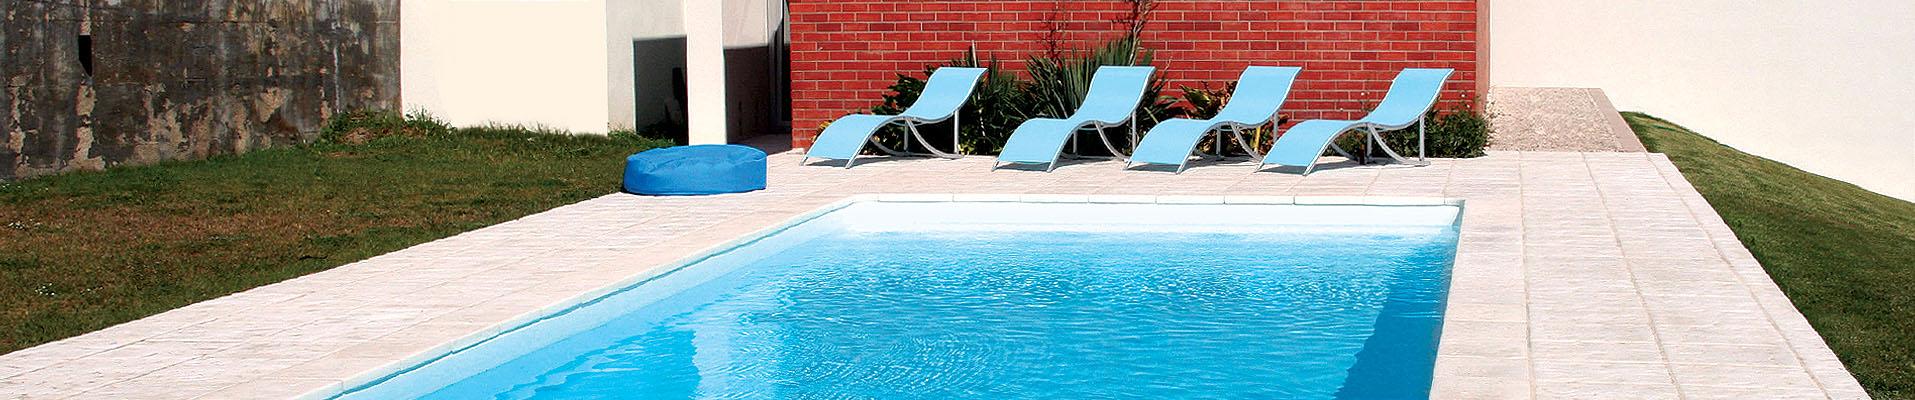 piscinas inoblock 100% betão